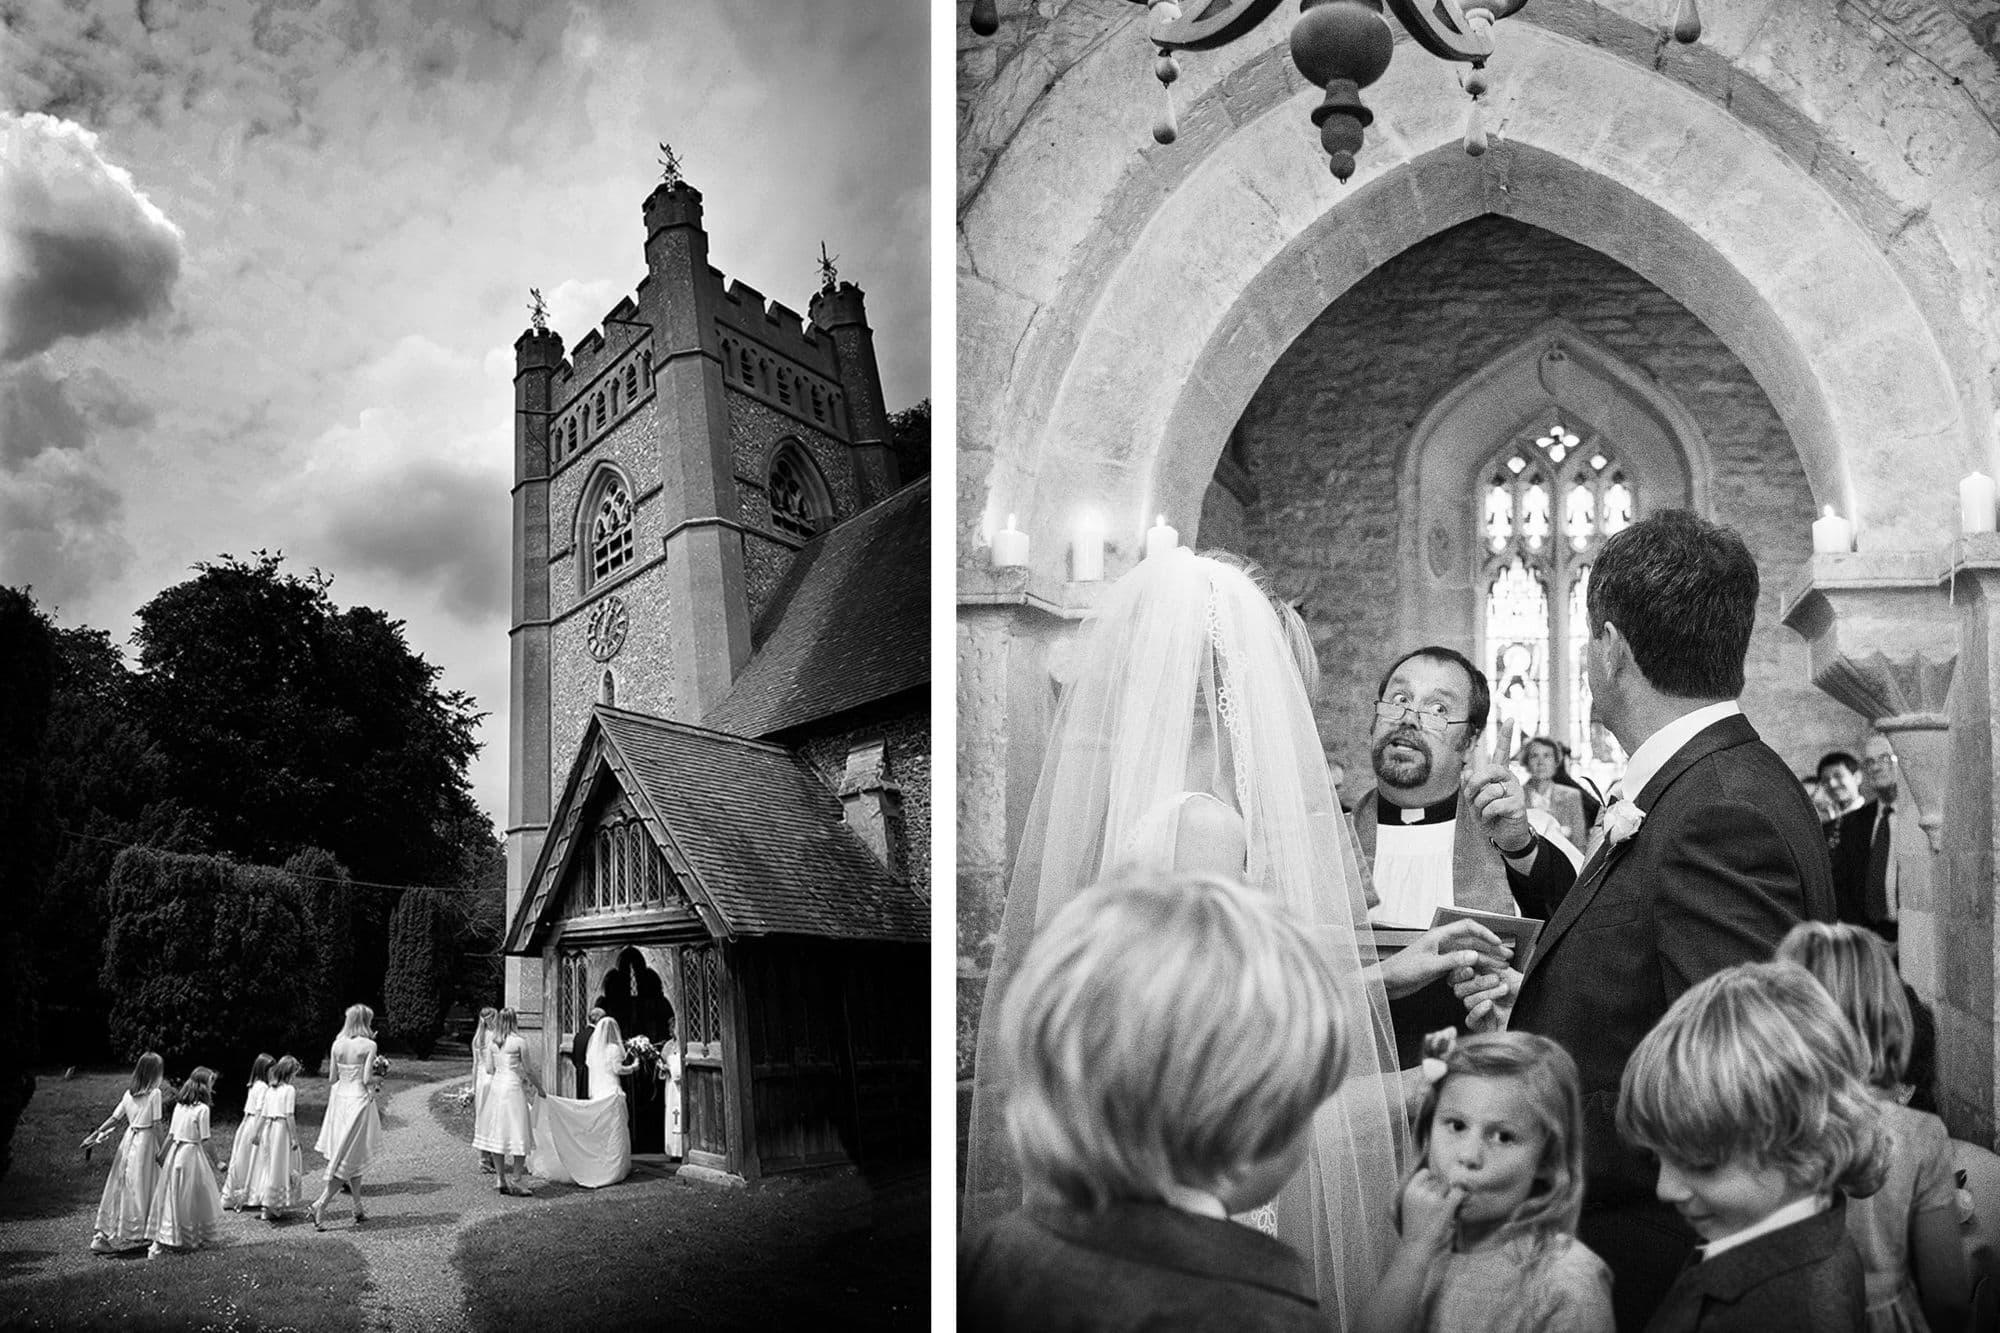 Mark-Seymour-Wedding-Photographer-UK-08 8